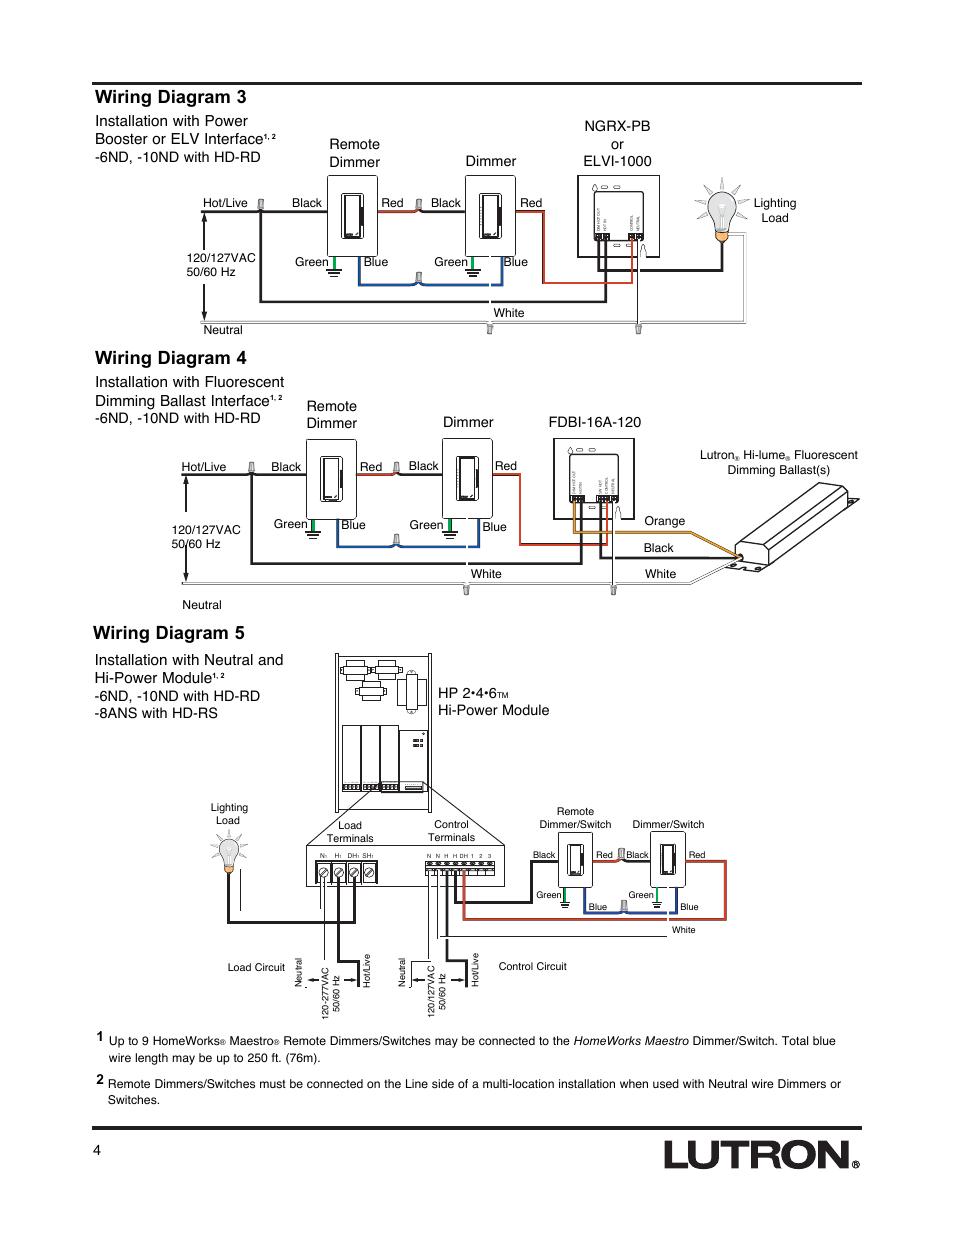 Wiring Dimming Leviton Diagram Ballast Sd2j8 Auto Electrical Lutron Hi Lume 45